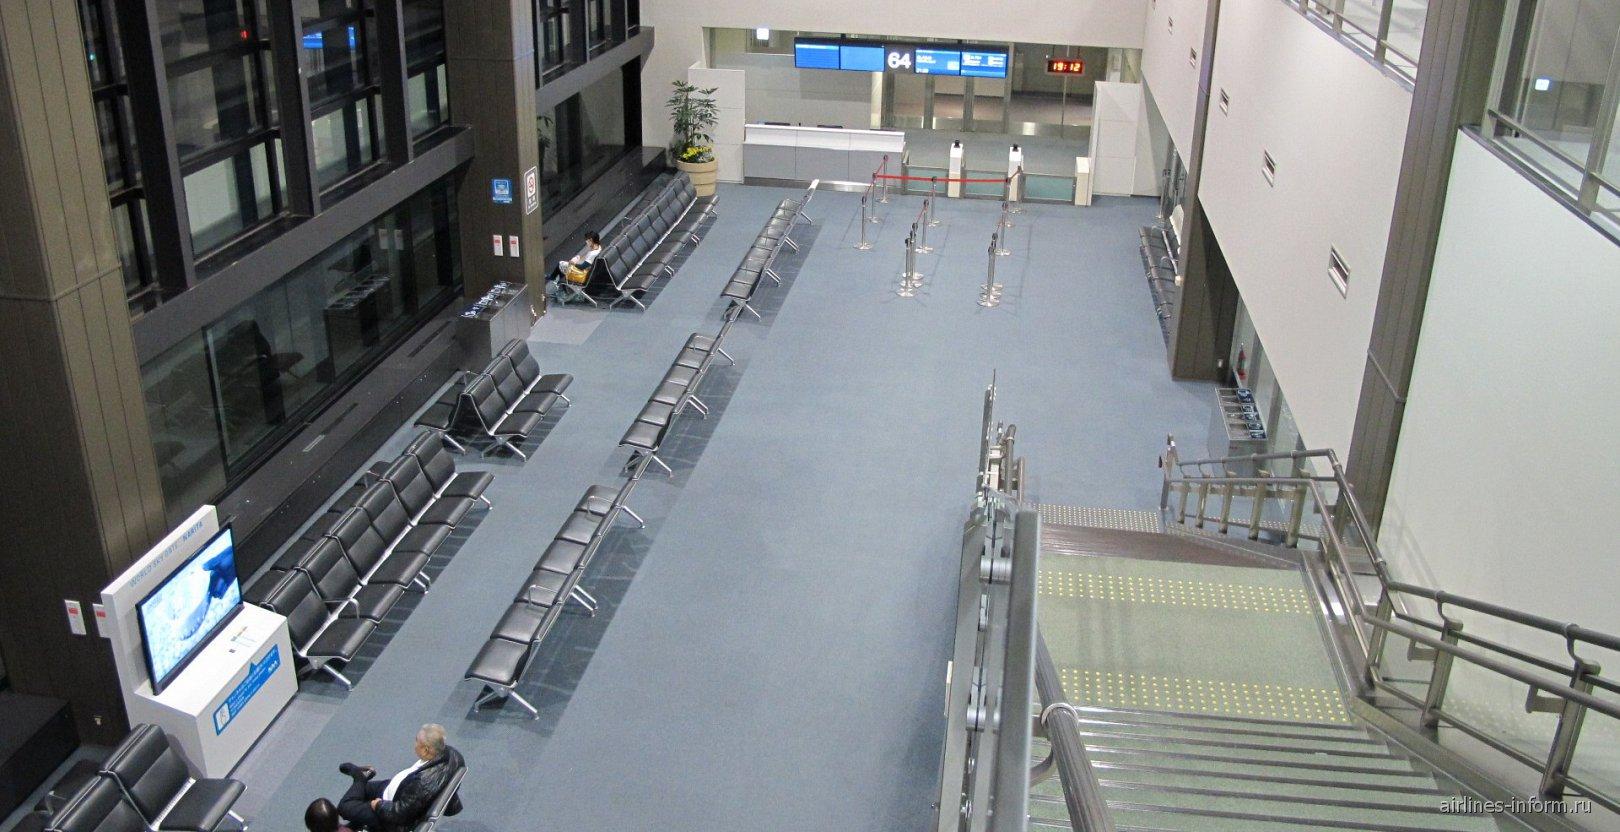 Зал ожидания у выхода на посадку в терминале 2 аэропорта Токио Нарита